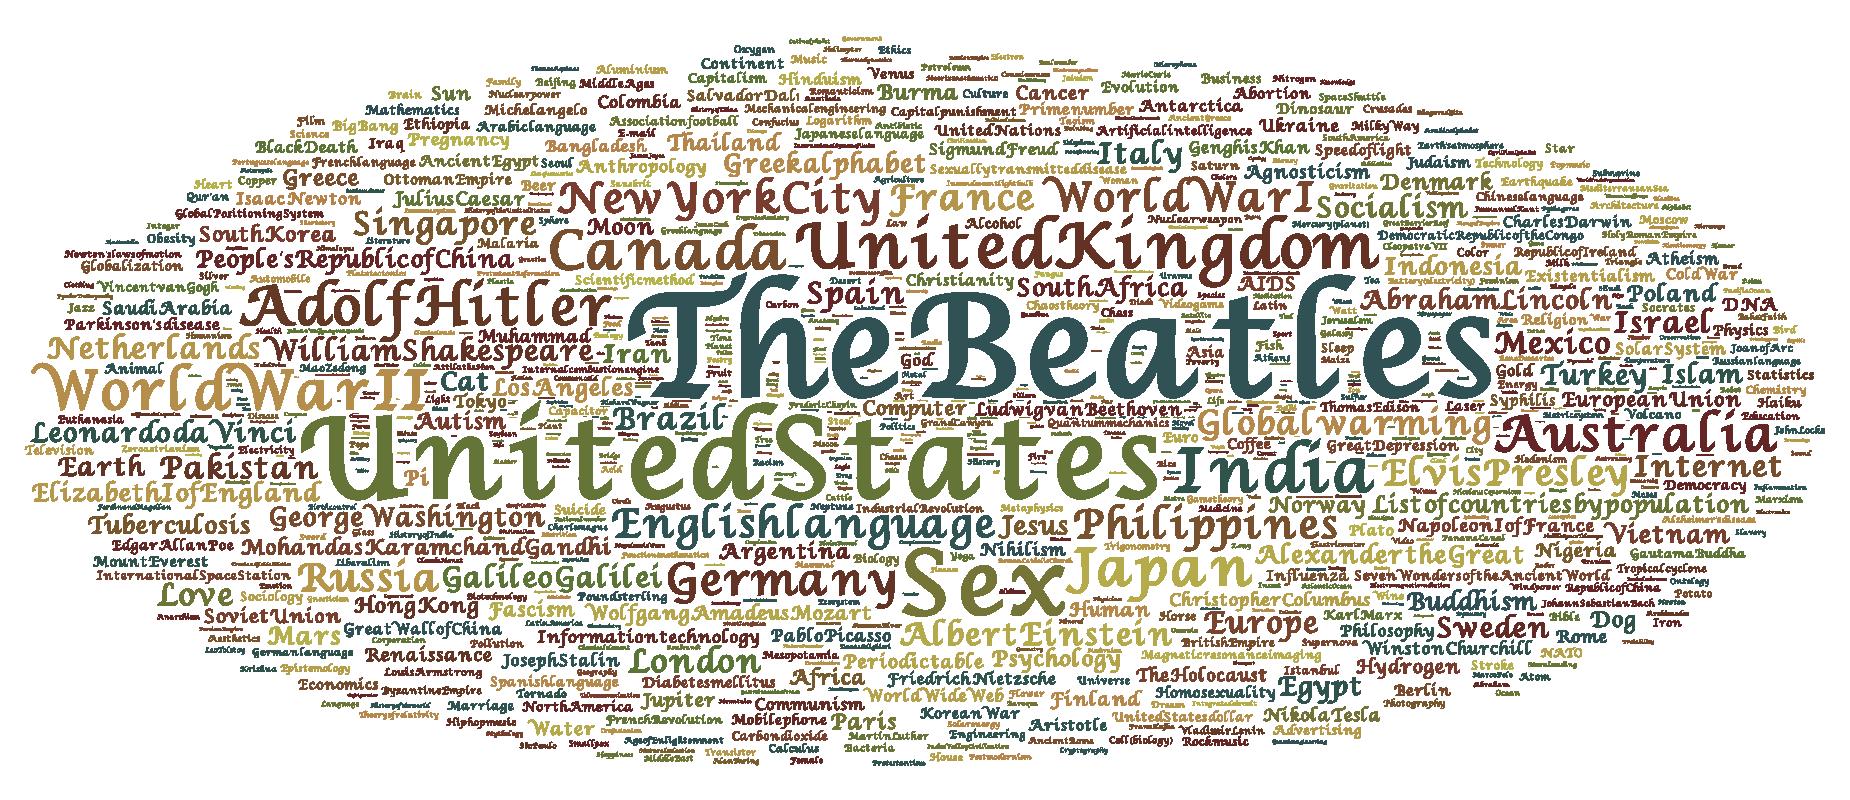 File:Wikipedia Wordle - Top 1000 vital article hits png - Wikimedia